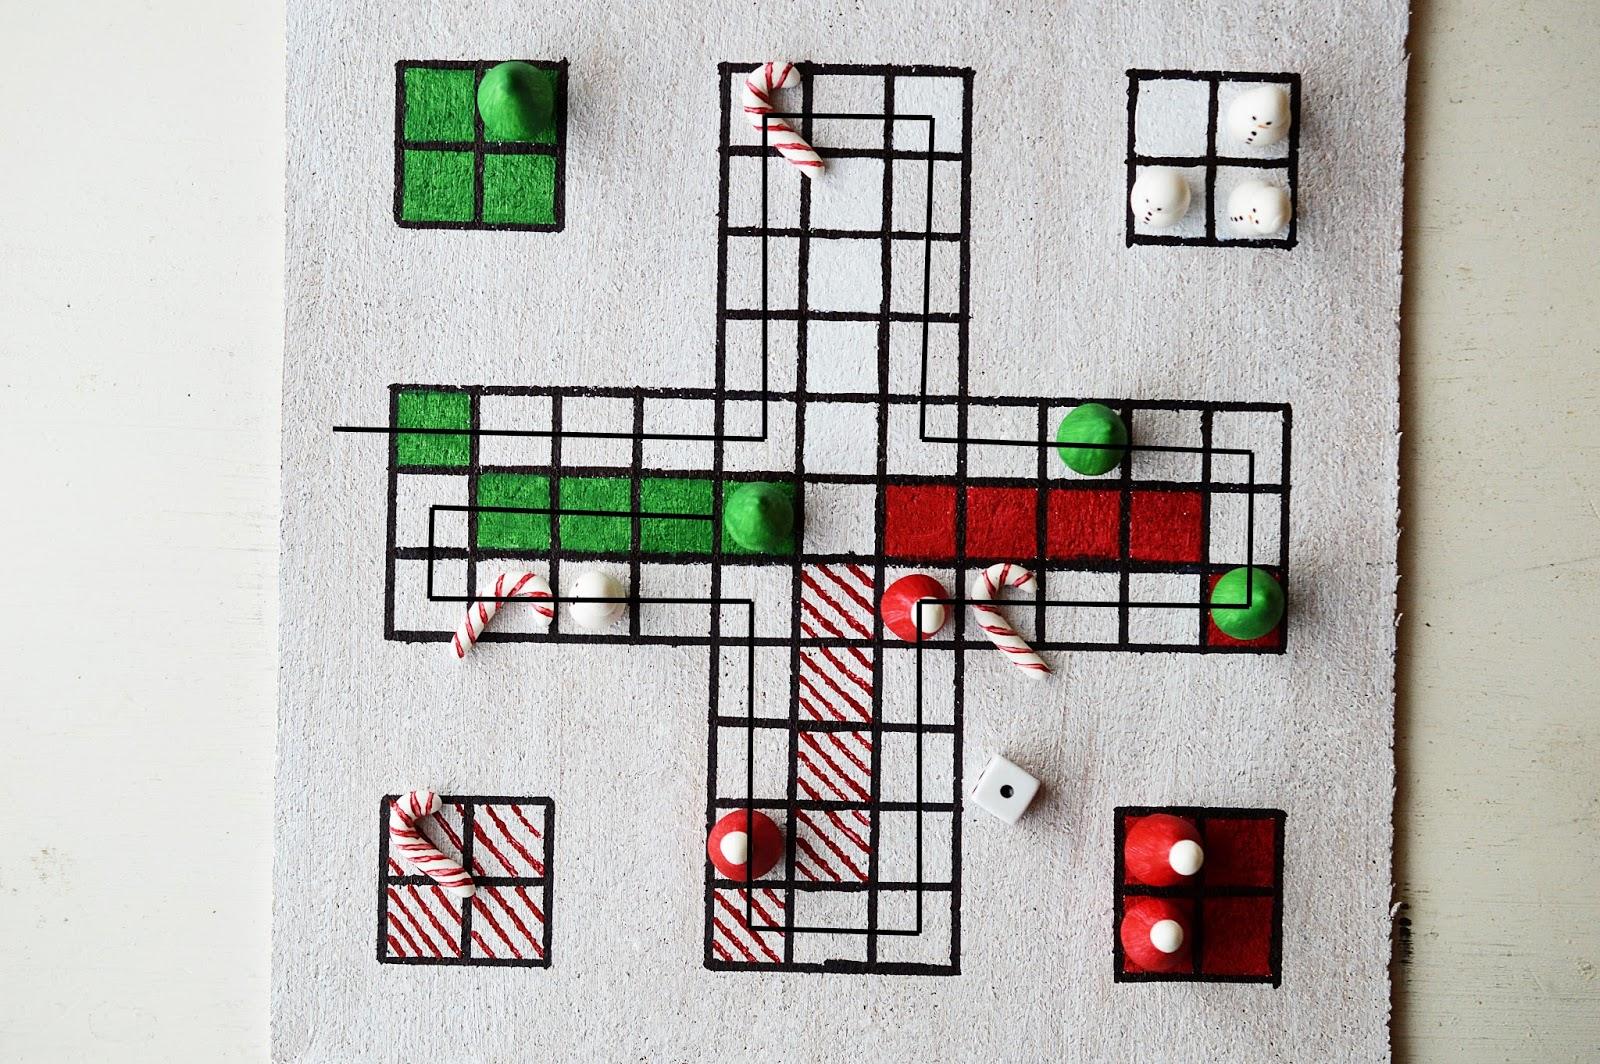 DIY Christmas Board Game | Santa ärgere dich nicht